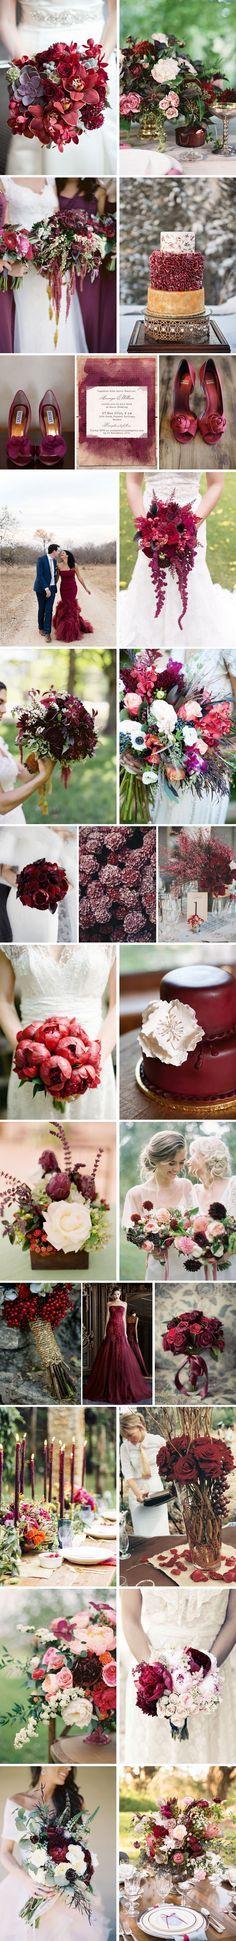 FALL WEDDINGS • MY FAV